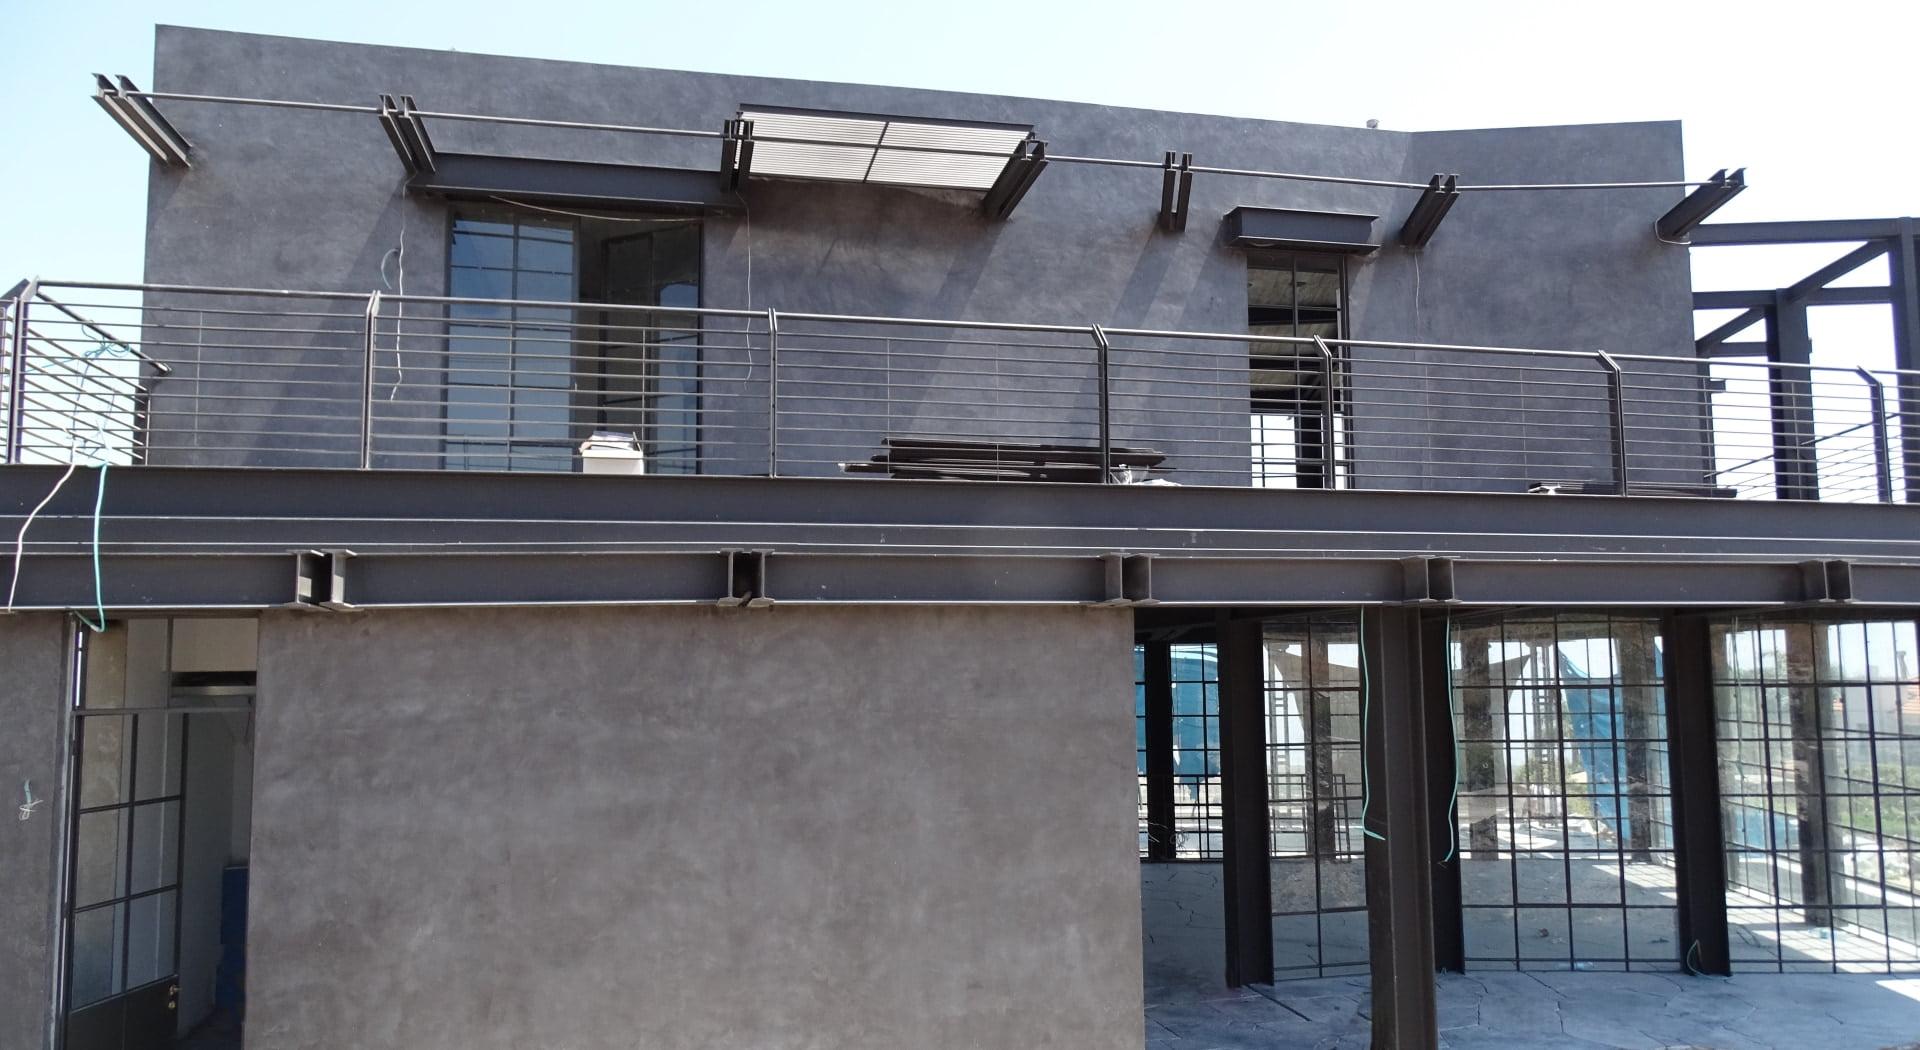 בטון אדריכלי חיפוי חיצוני לבית